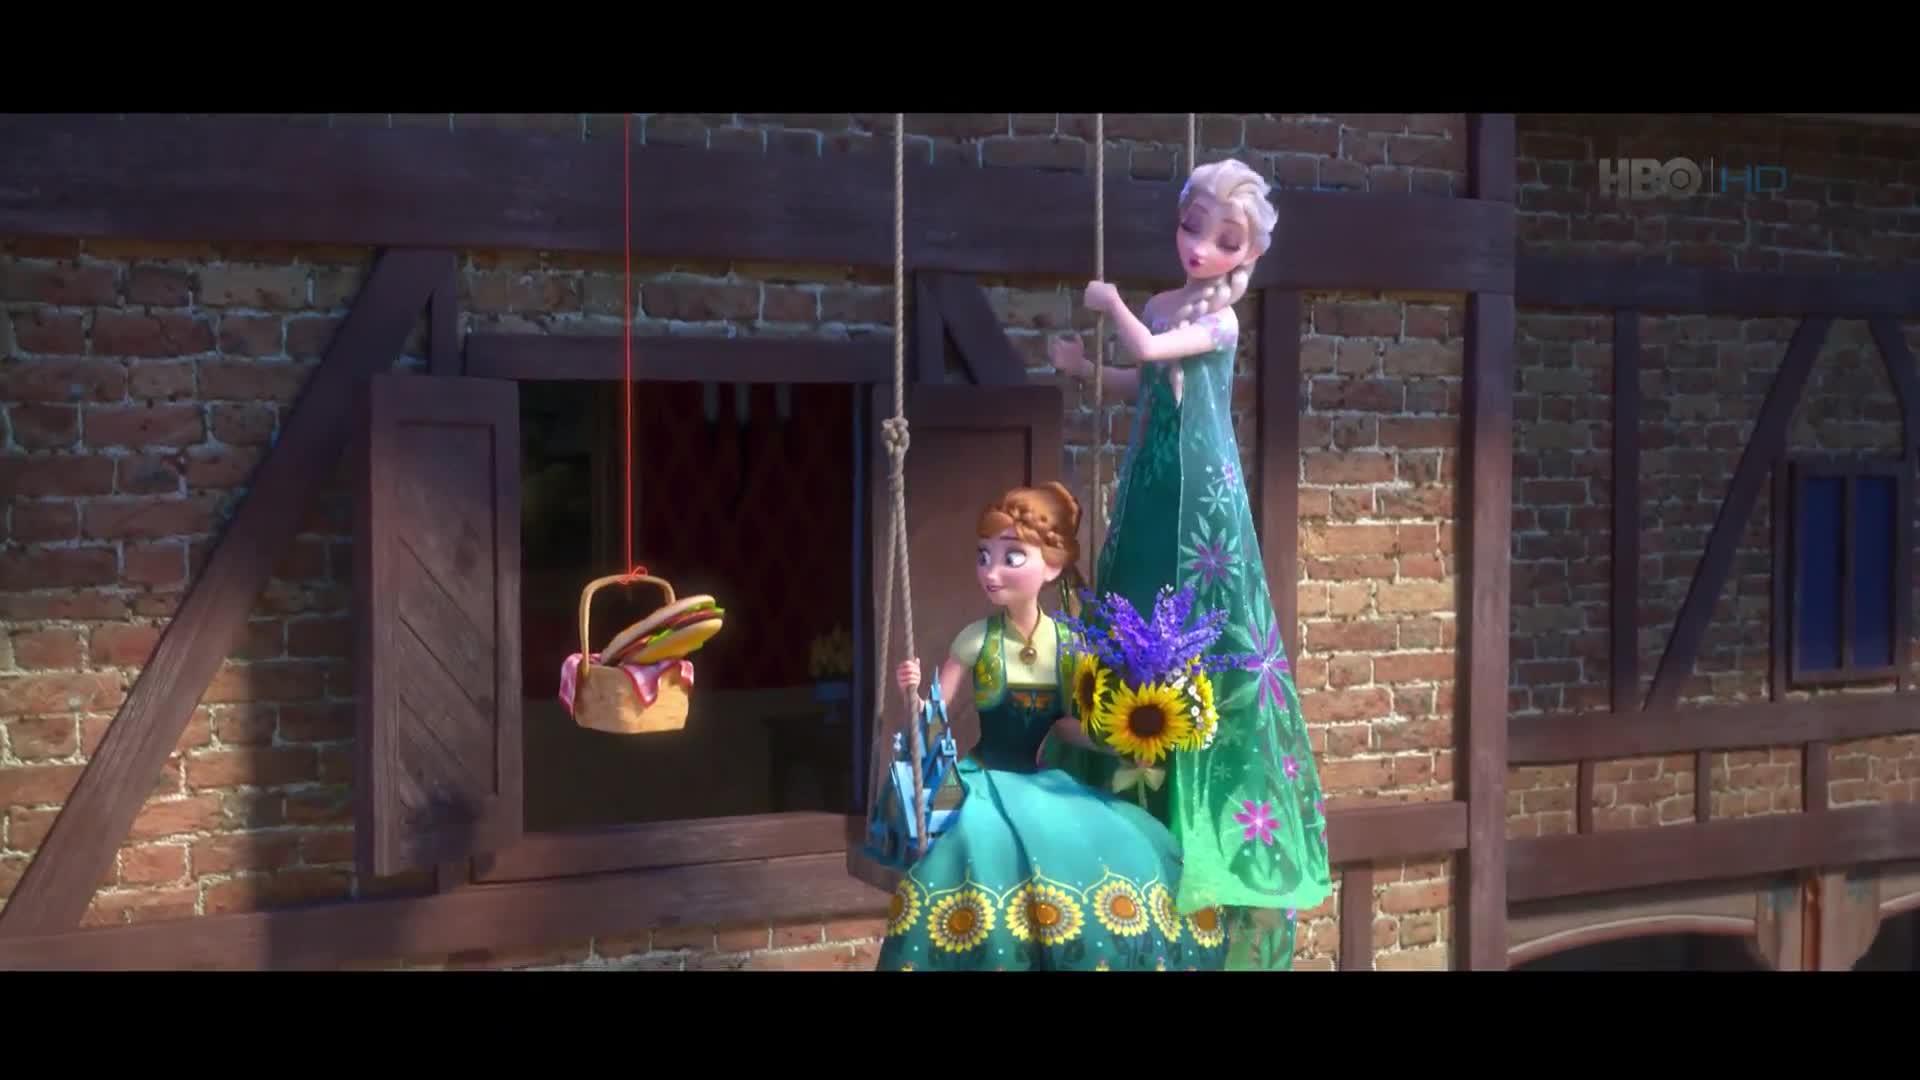 Disneyho kratke animovane filmy 1    2015  HD cz